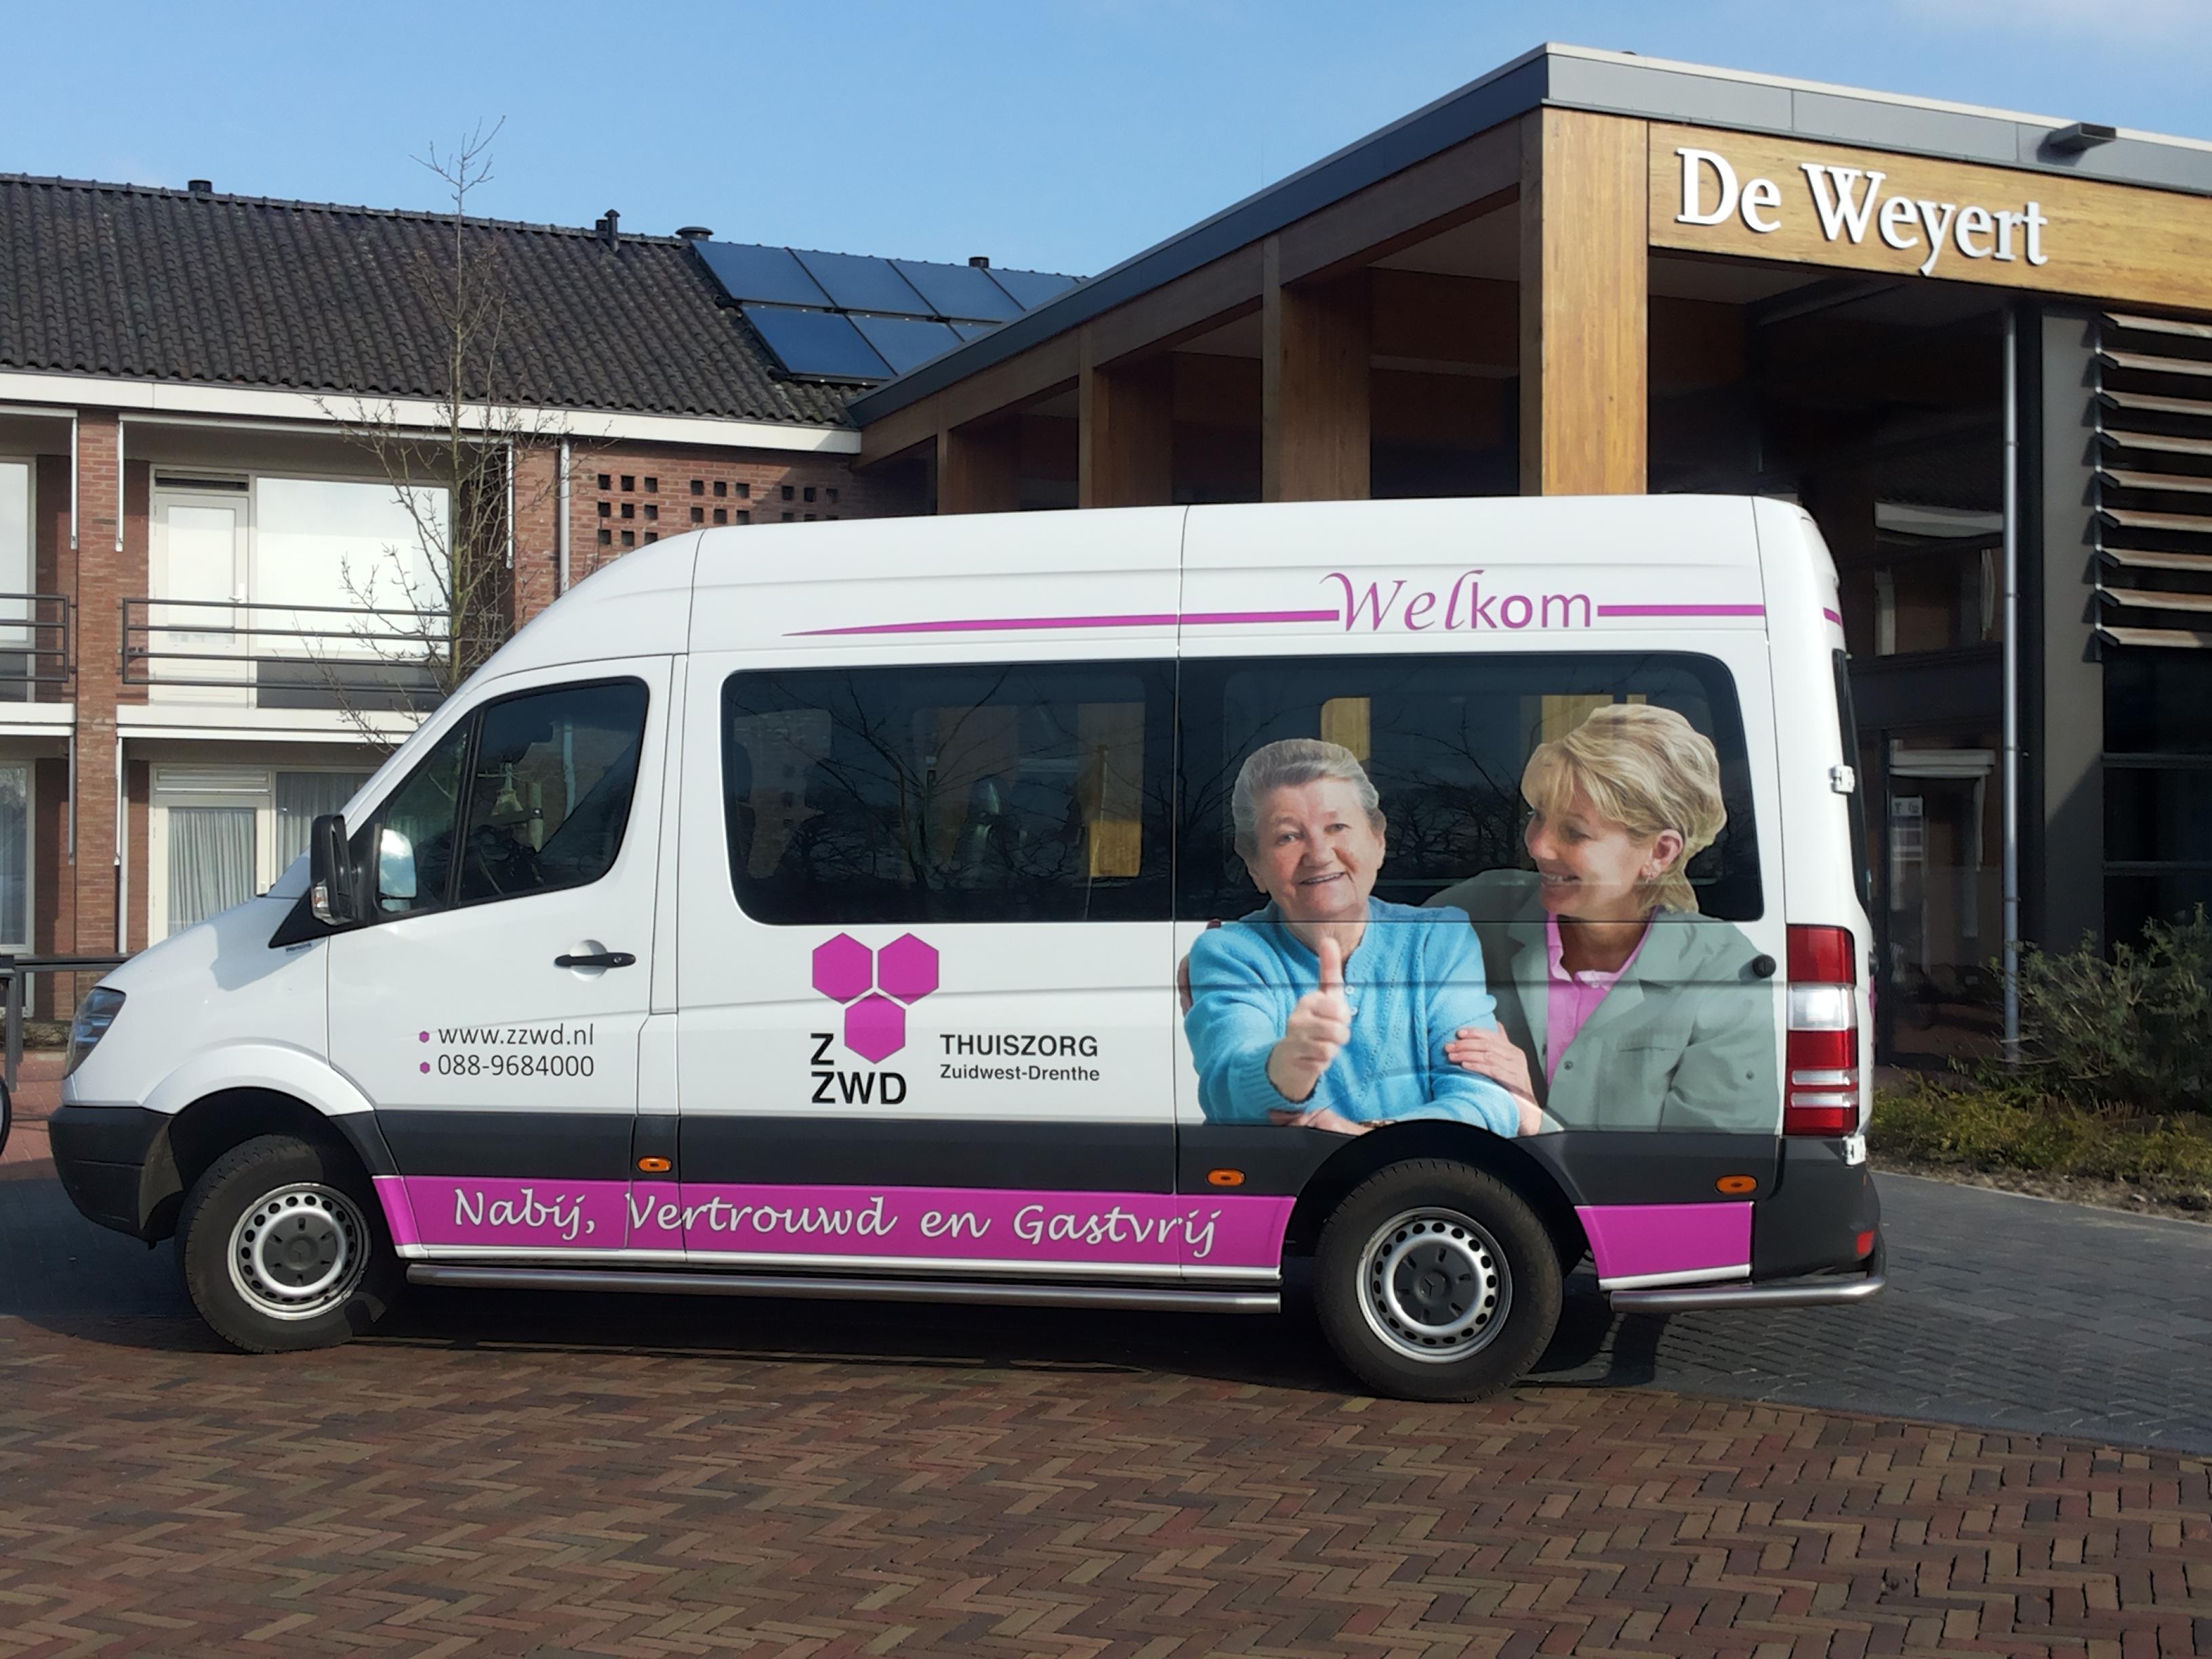 De Weyert Dwingeloo.Thuiszorg Zuidwest Drenthe Kiesvoorjezorg Nl